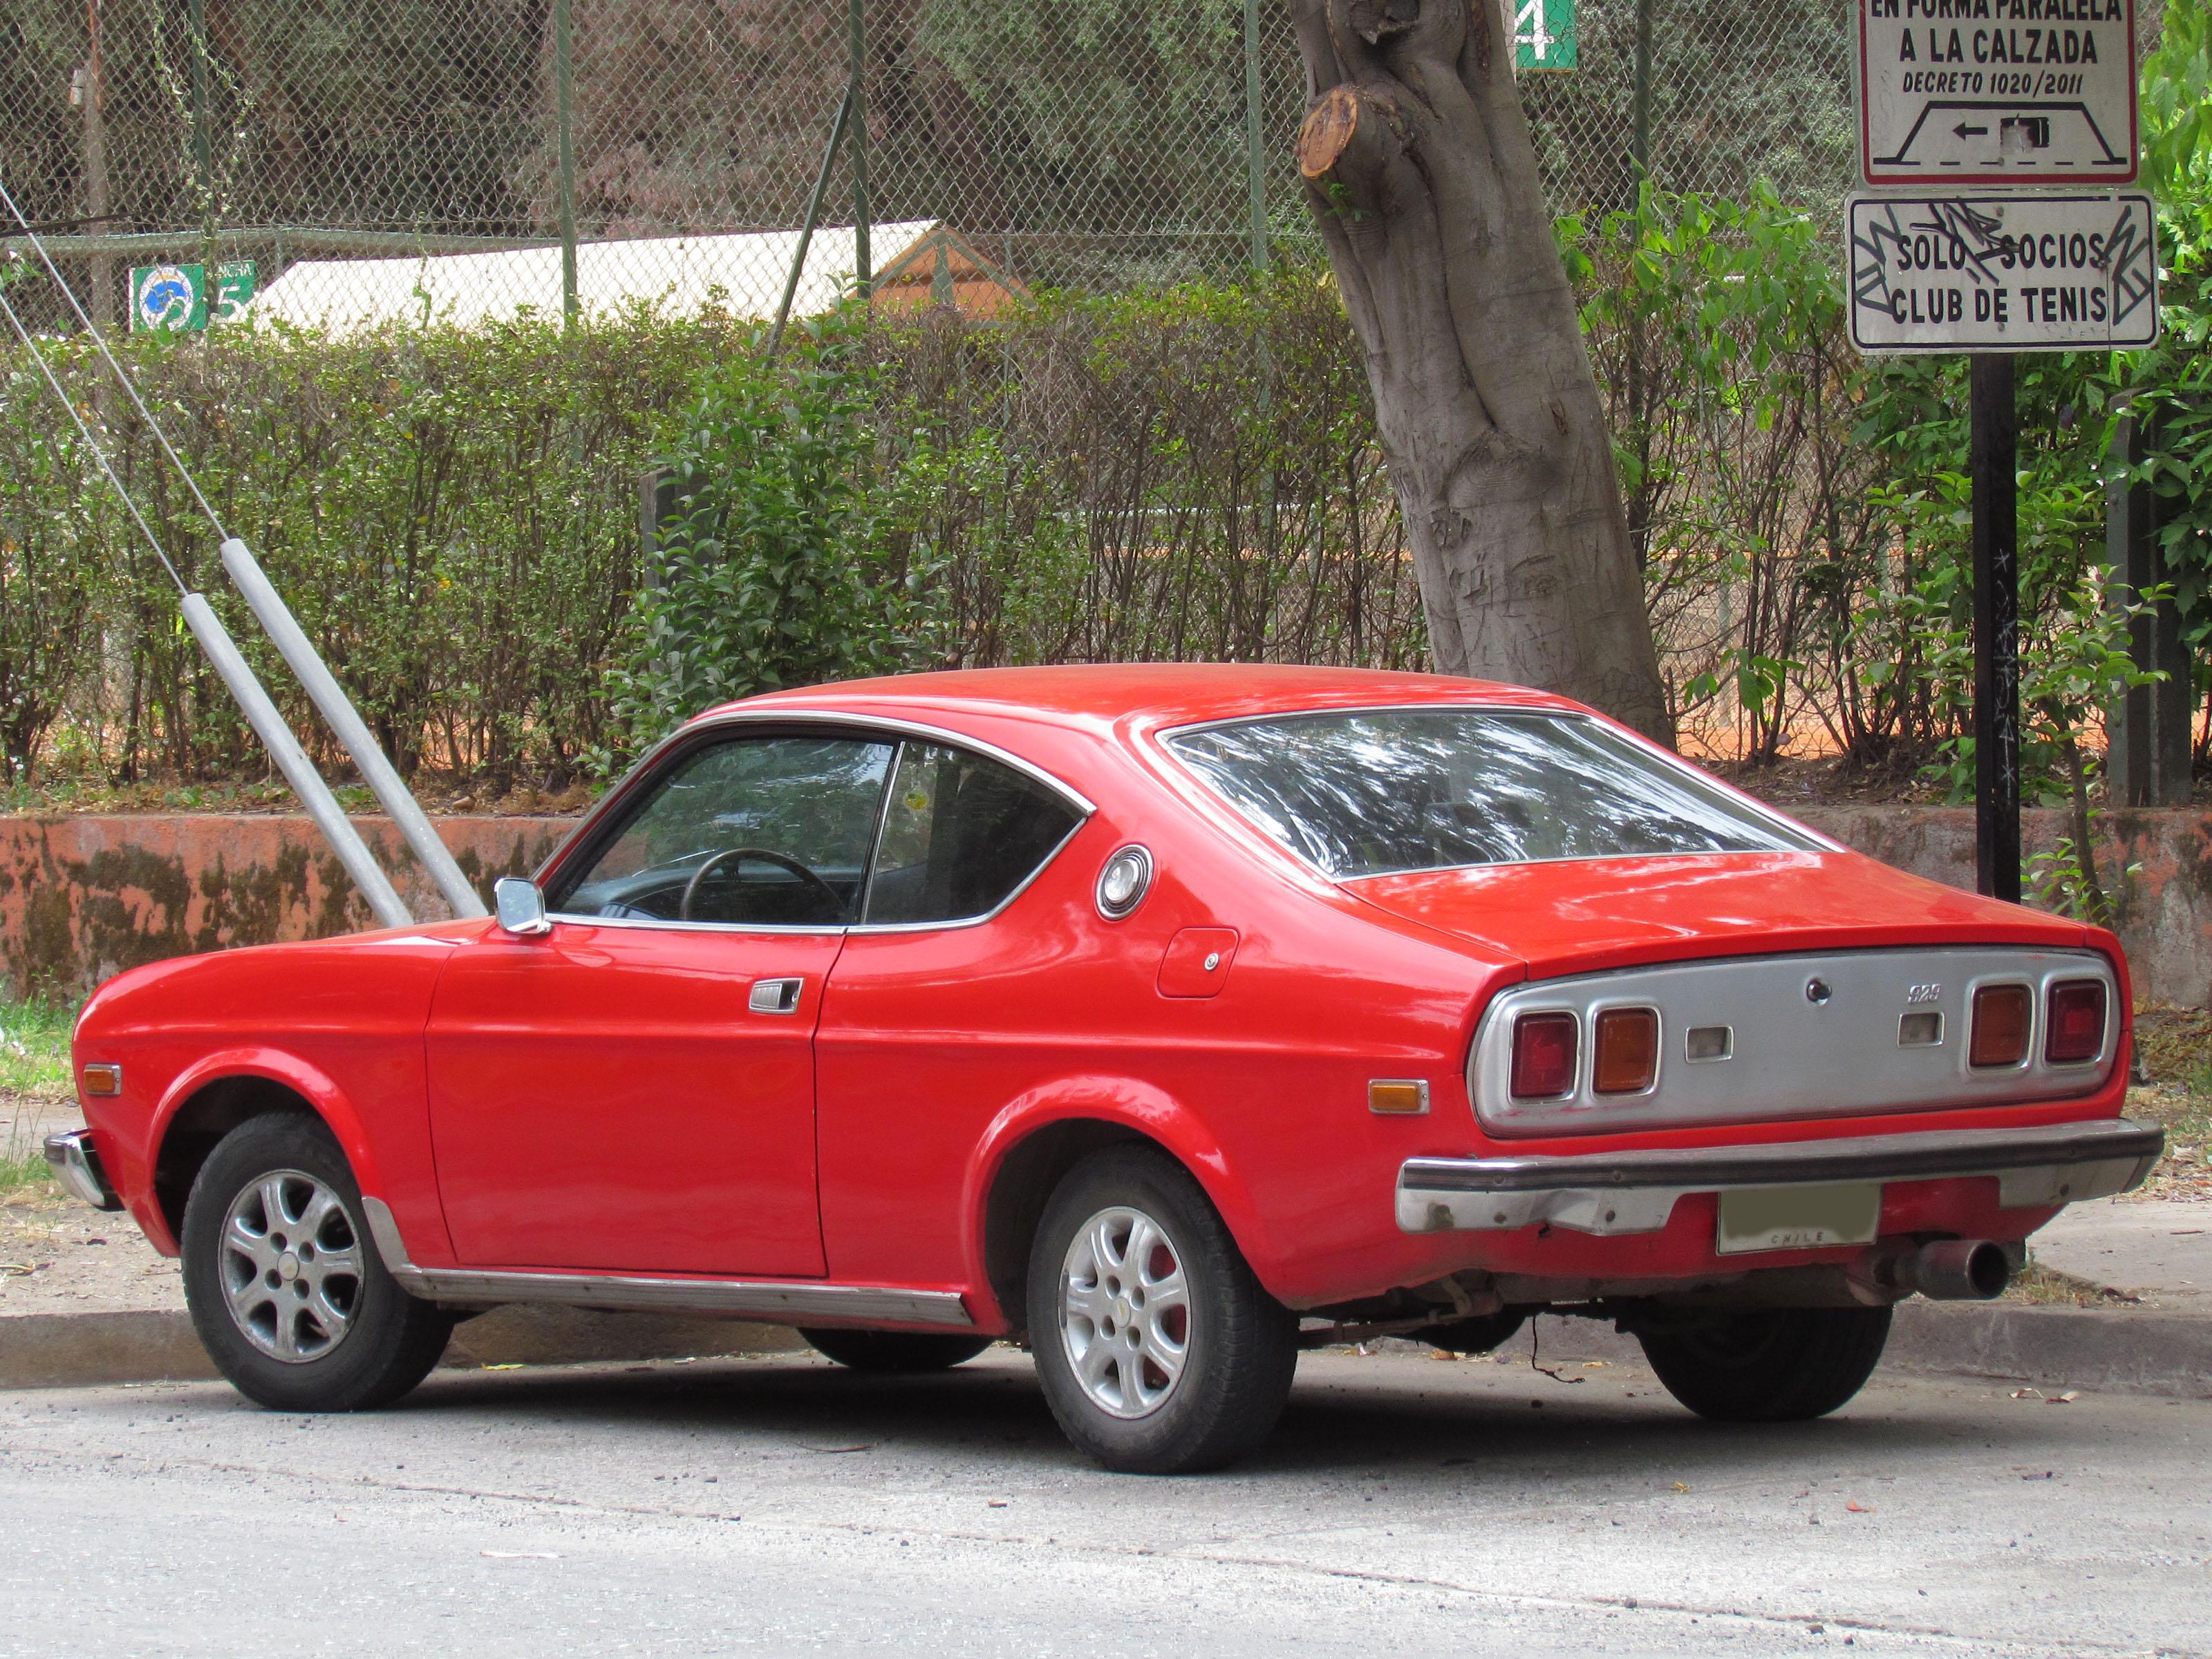 File:Mazda 929 Hardtop Coupe 1976 (11317464073).jpg